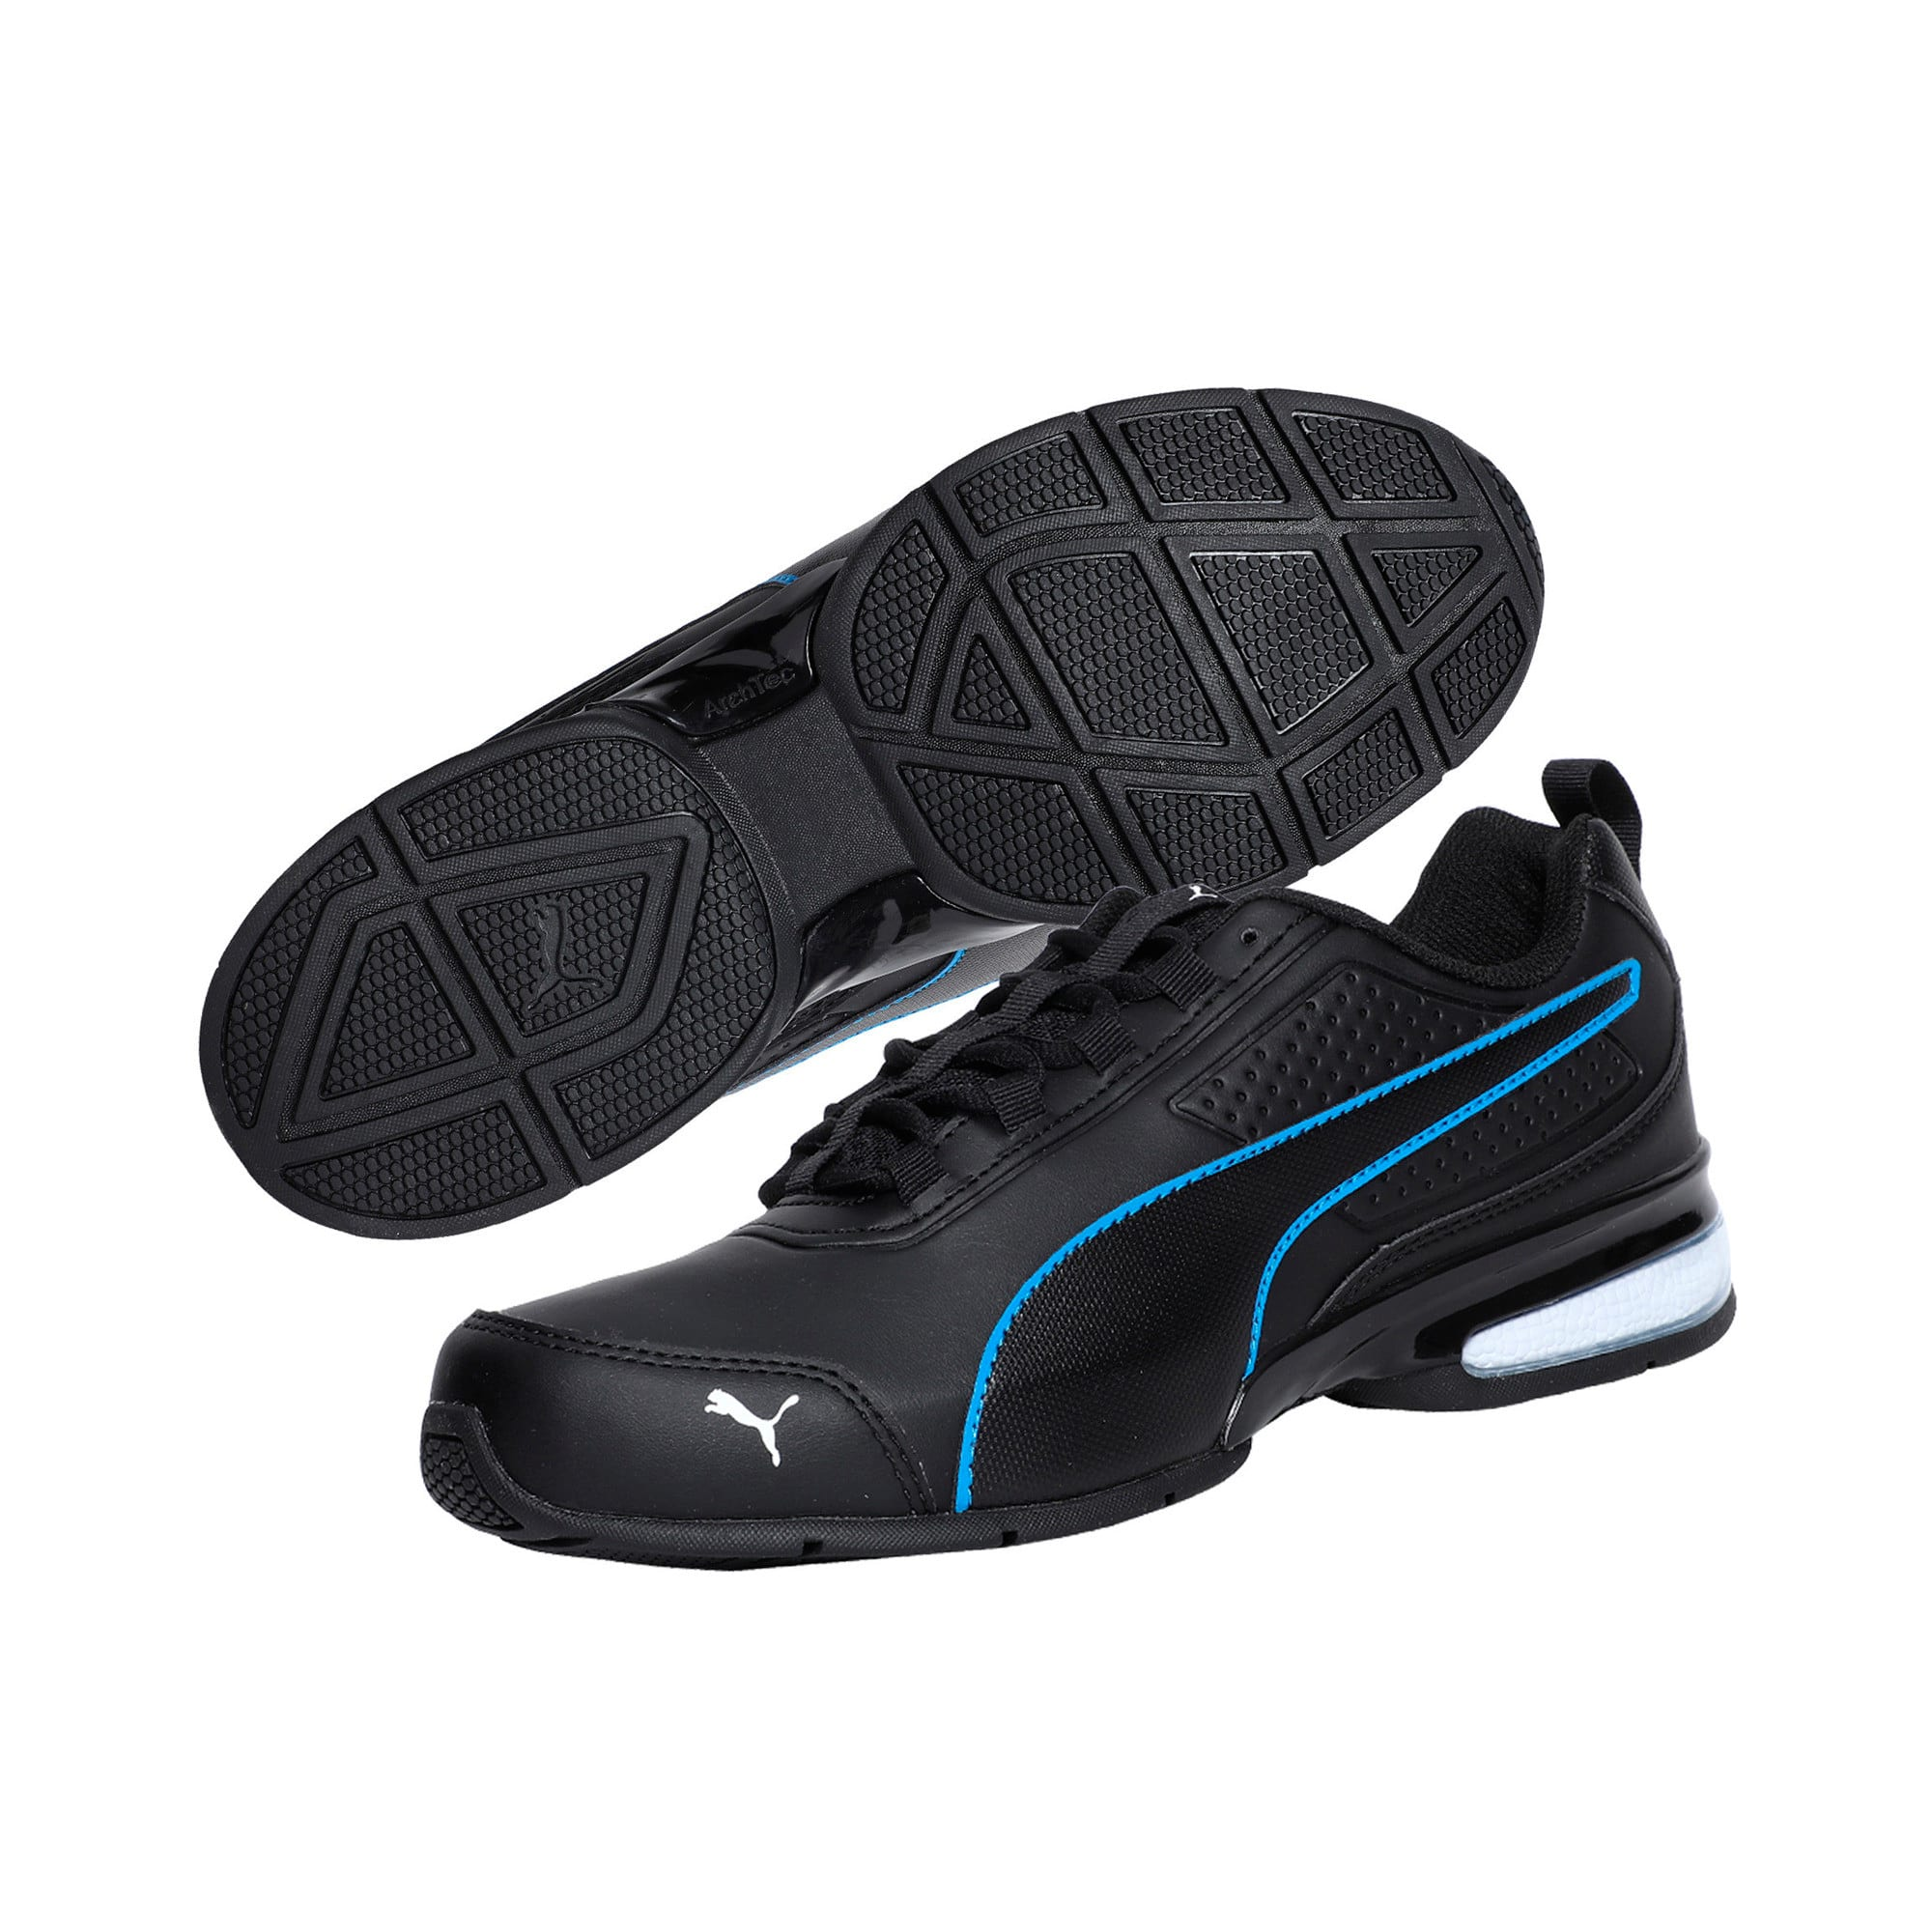 Thumbnail 2 of Leader VT SL Running Shoes, Black-White-Indigo Bunting, medium-IND